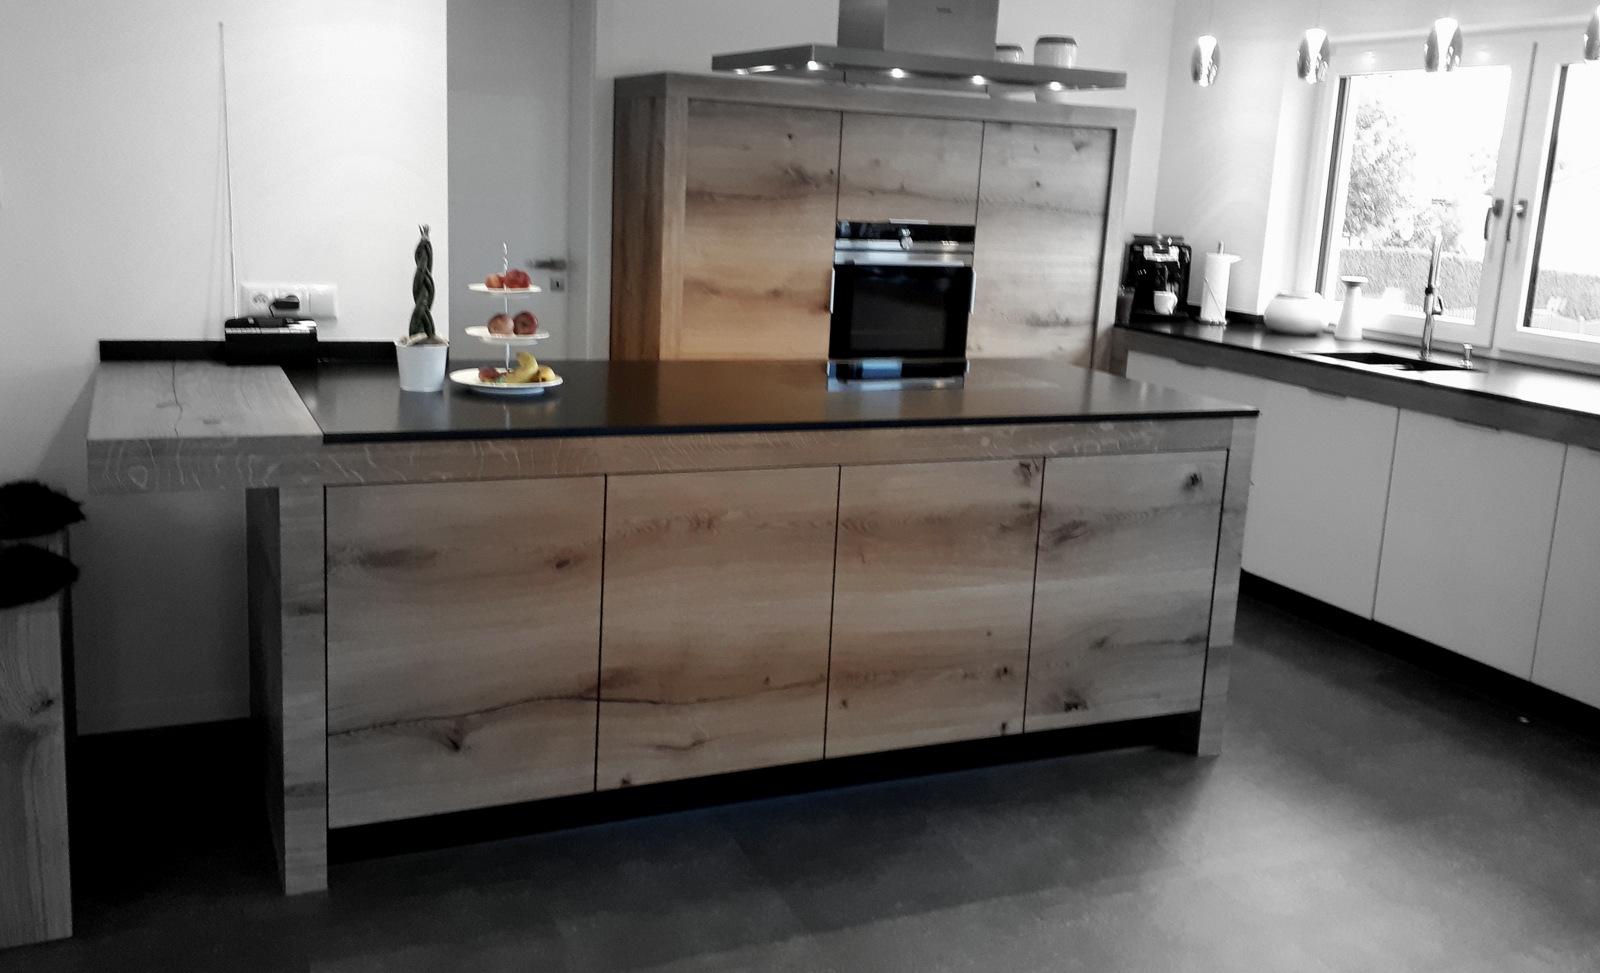 Full Size of Ikea Hochschrank Küche Hochschrank Küche Mit Auszug Hochschrank Küche Kühlschrank Hochschrank Küche Holz Küche Hochschrank Küche